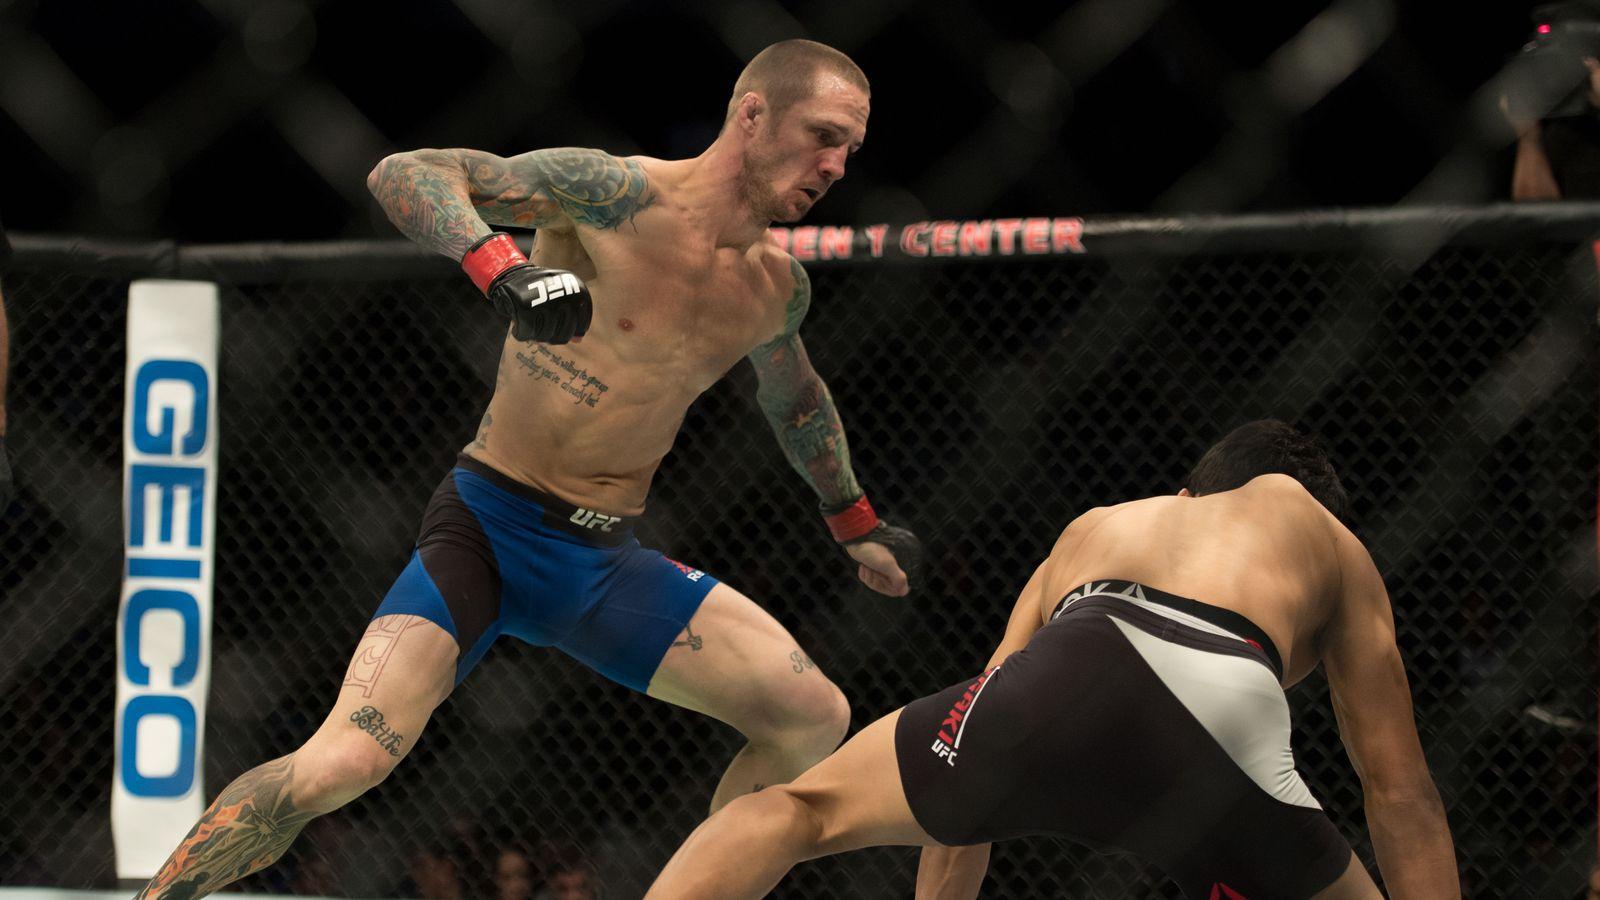 Ufc Fight Night 108 Fight Card John Dodson Vs Eddie